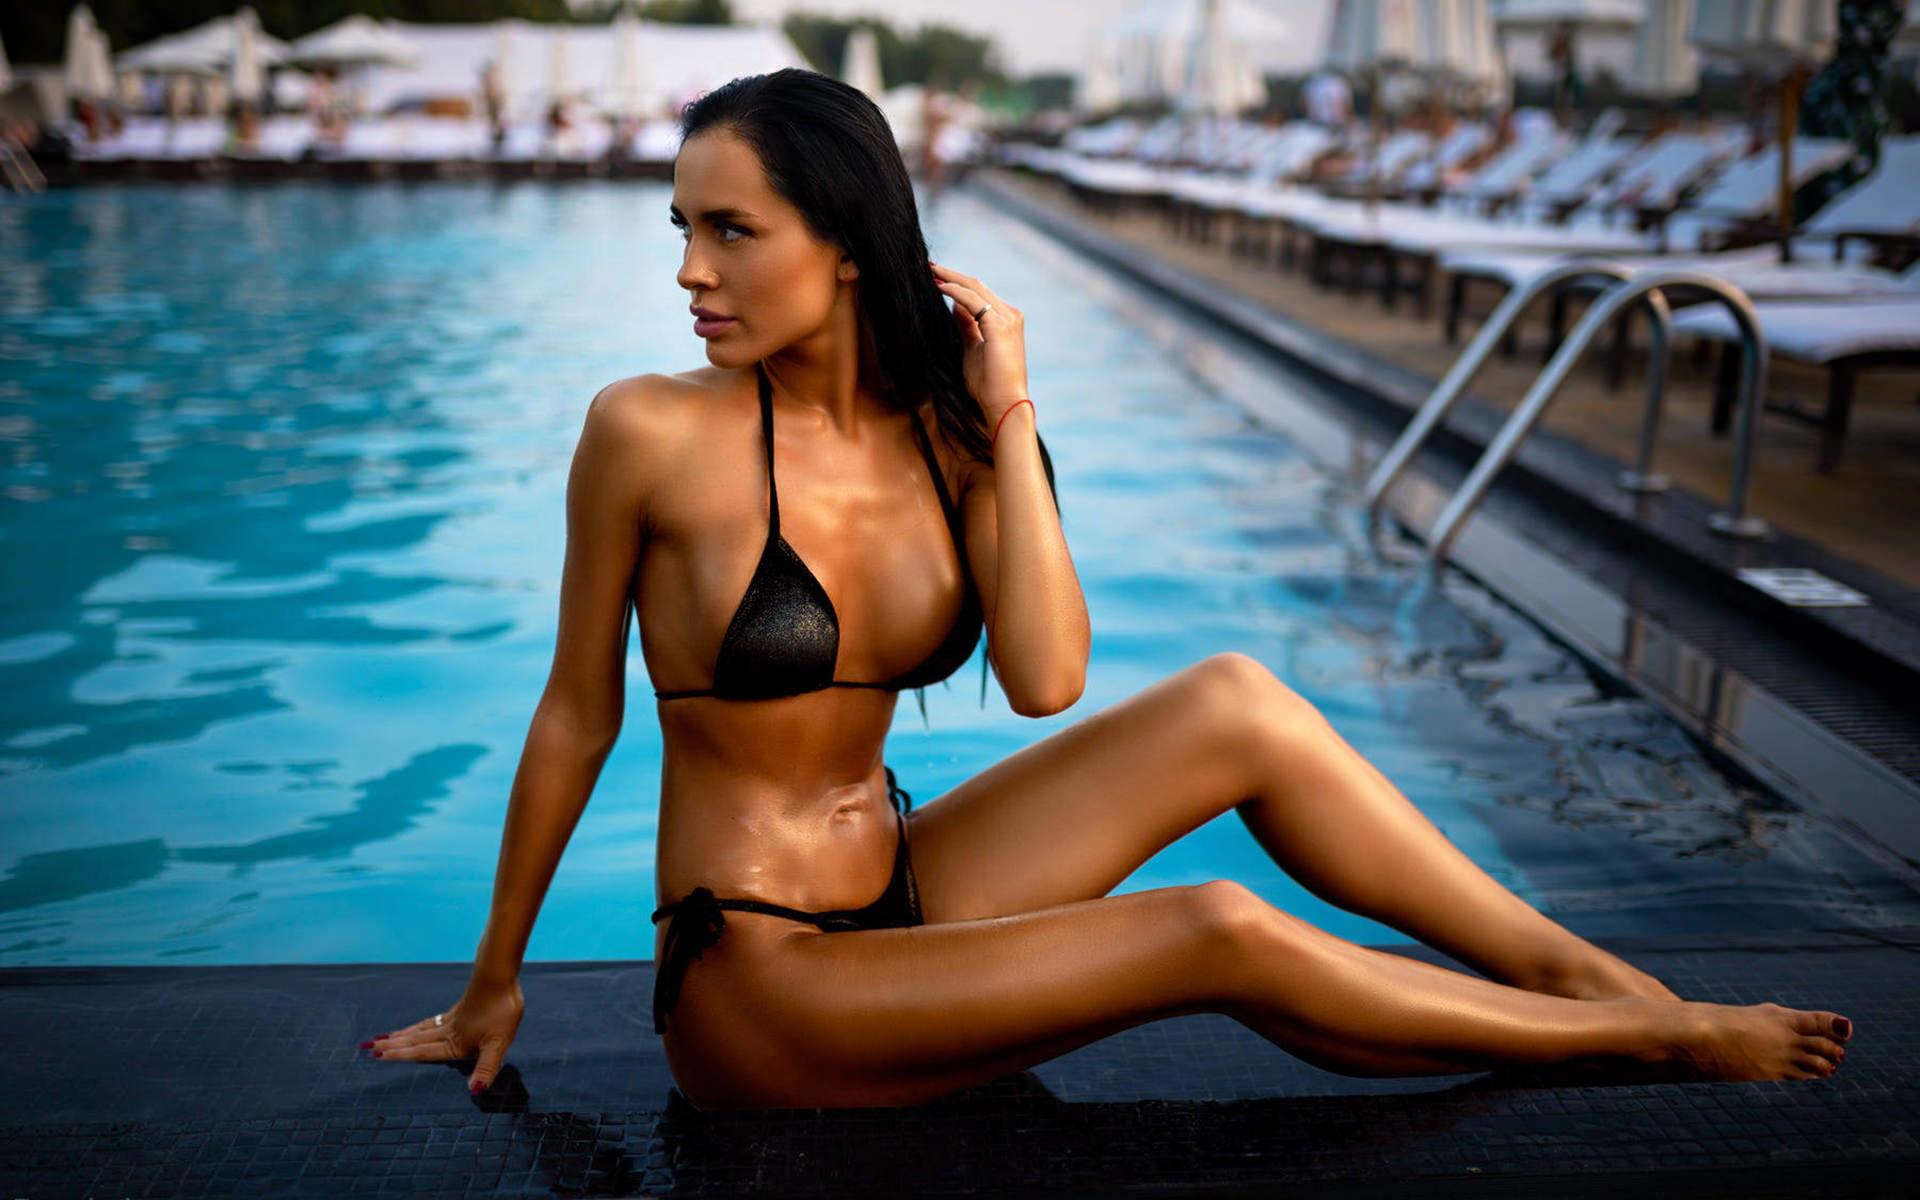 women, tanned, swimming pool, women outdoors, black bikini, belly, sitting, red nails, looking away, pink lipstick